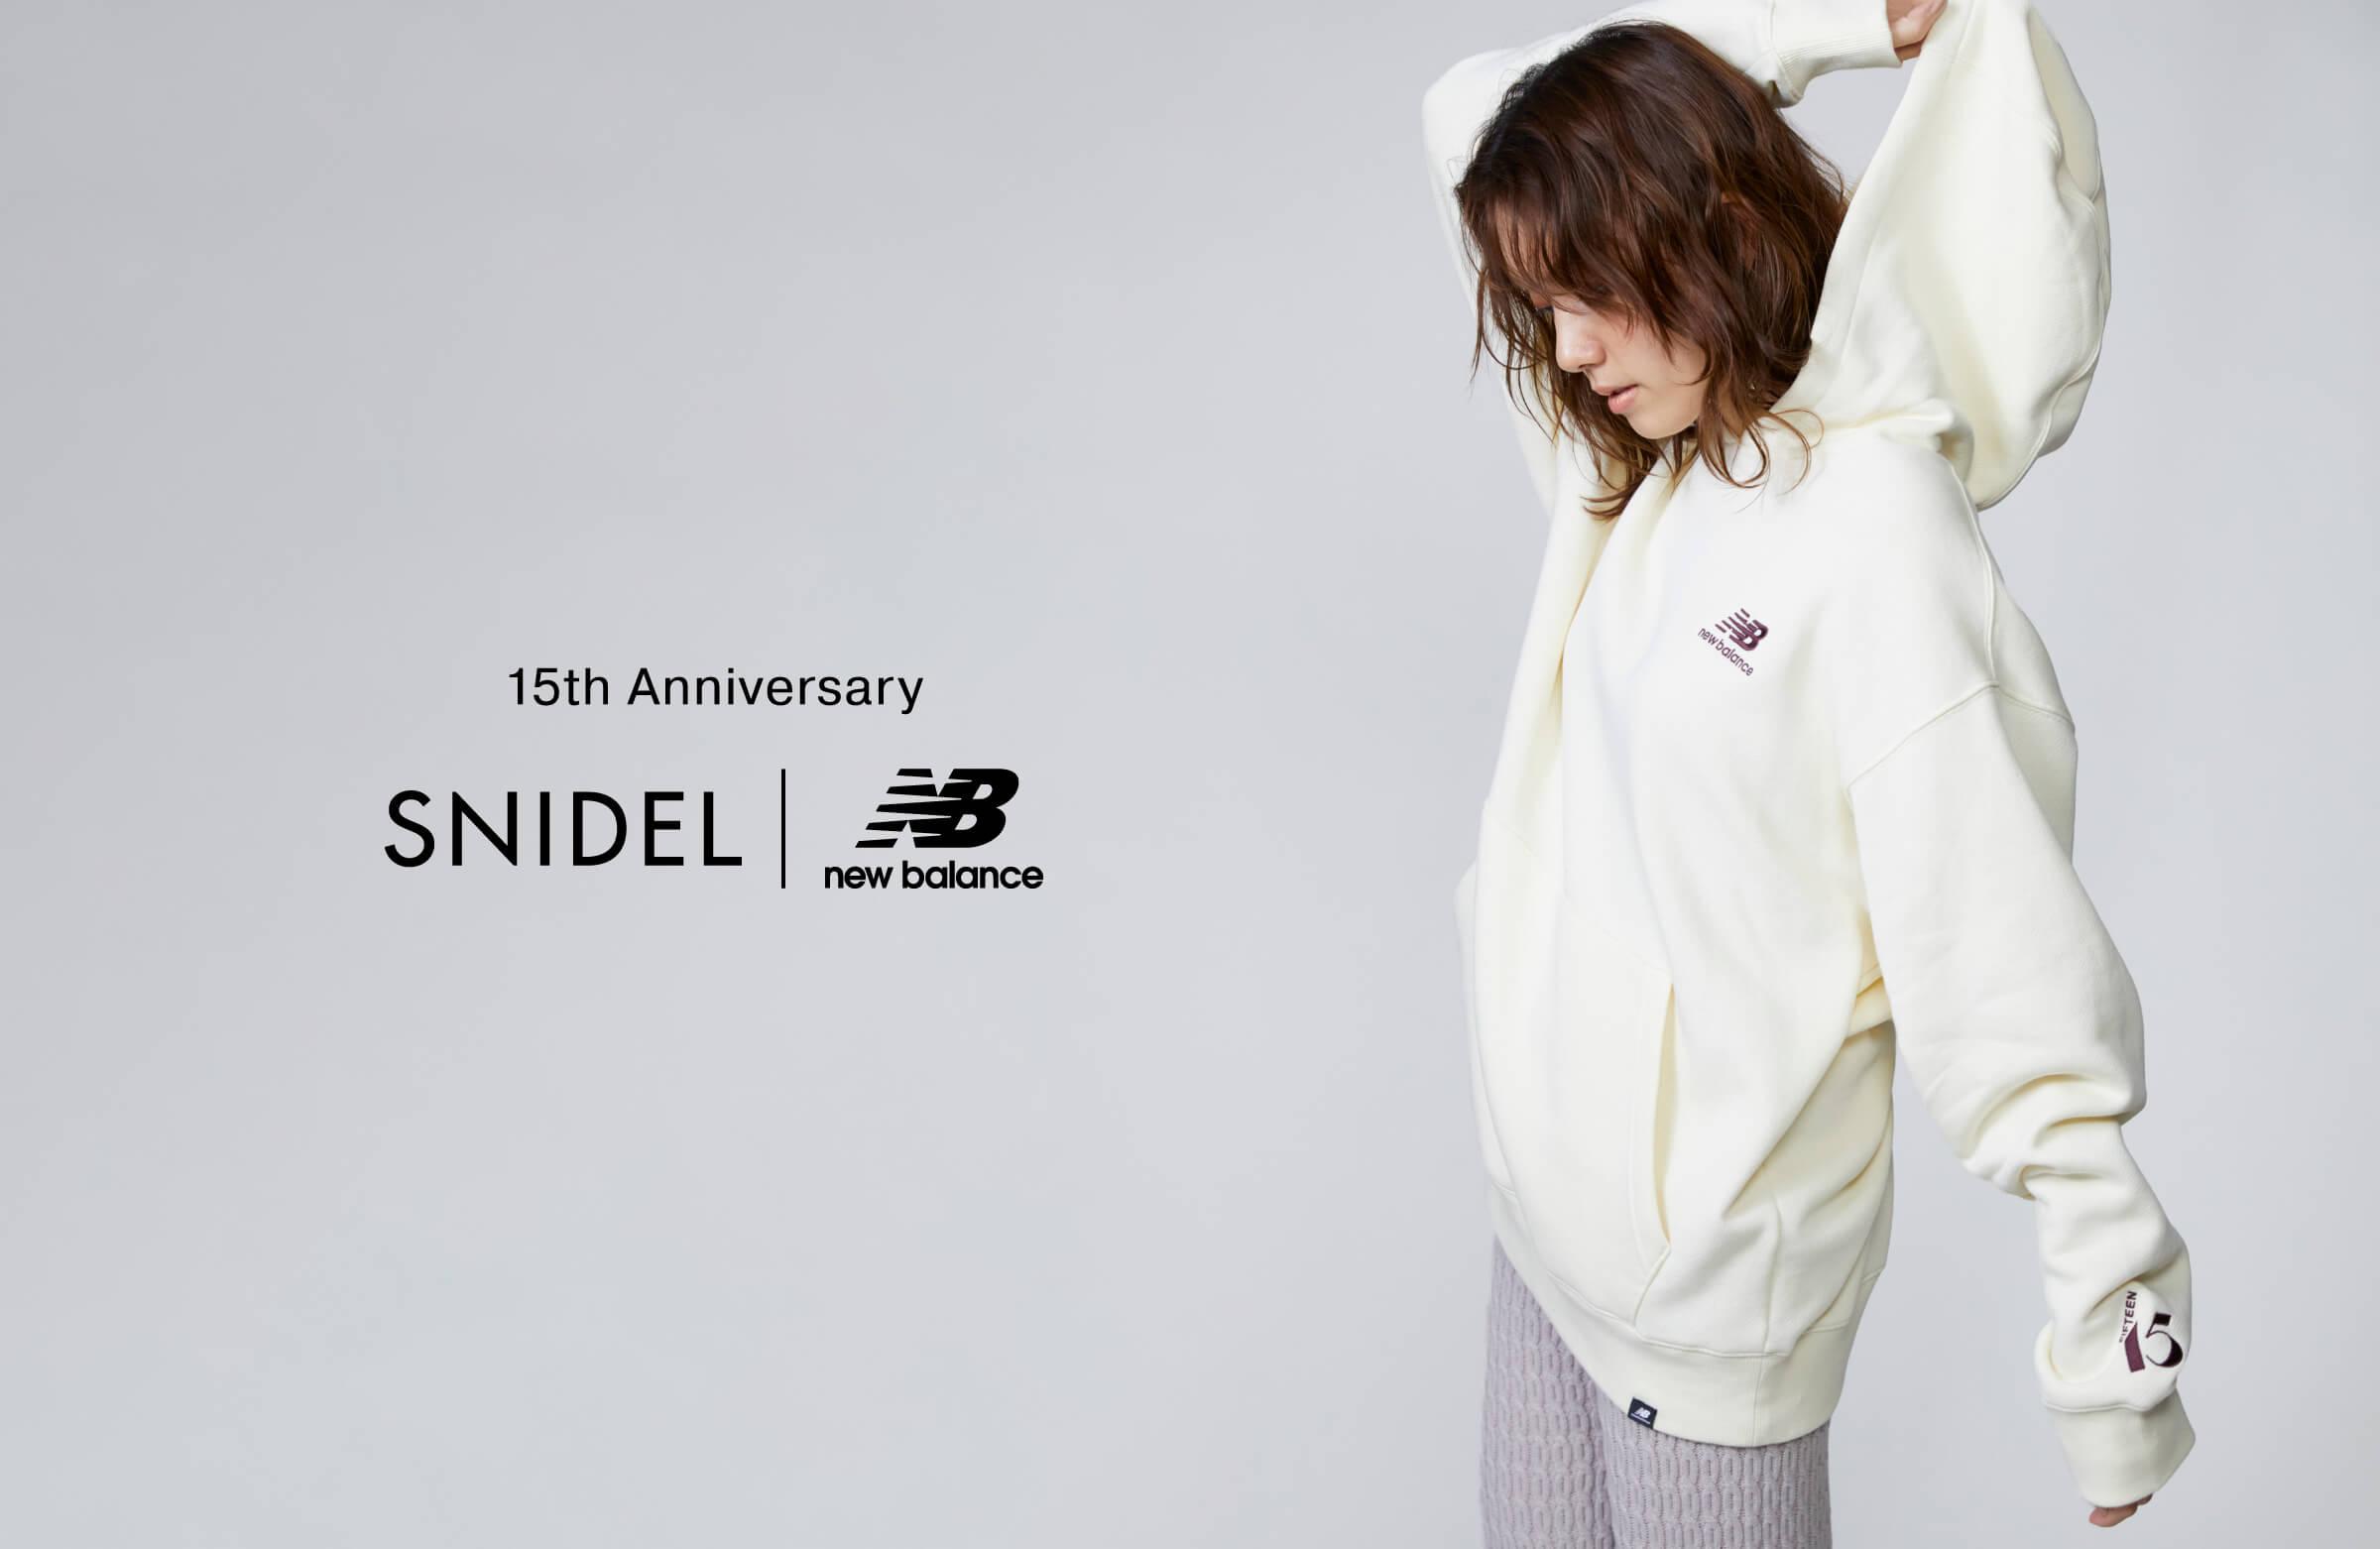 15th Anniversaty Snidel Newbalance